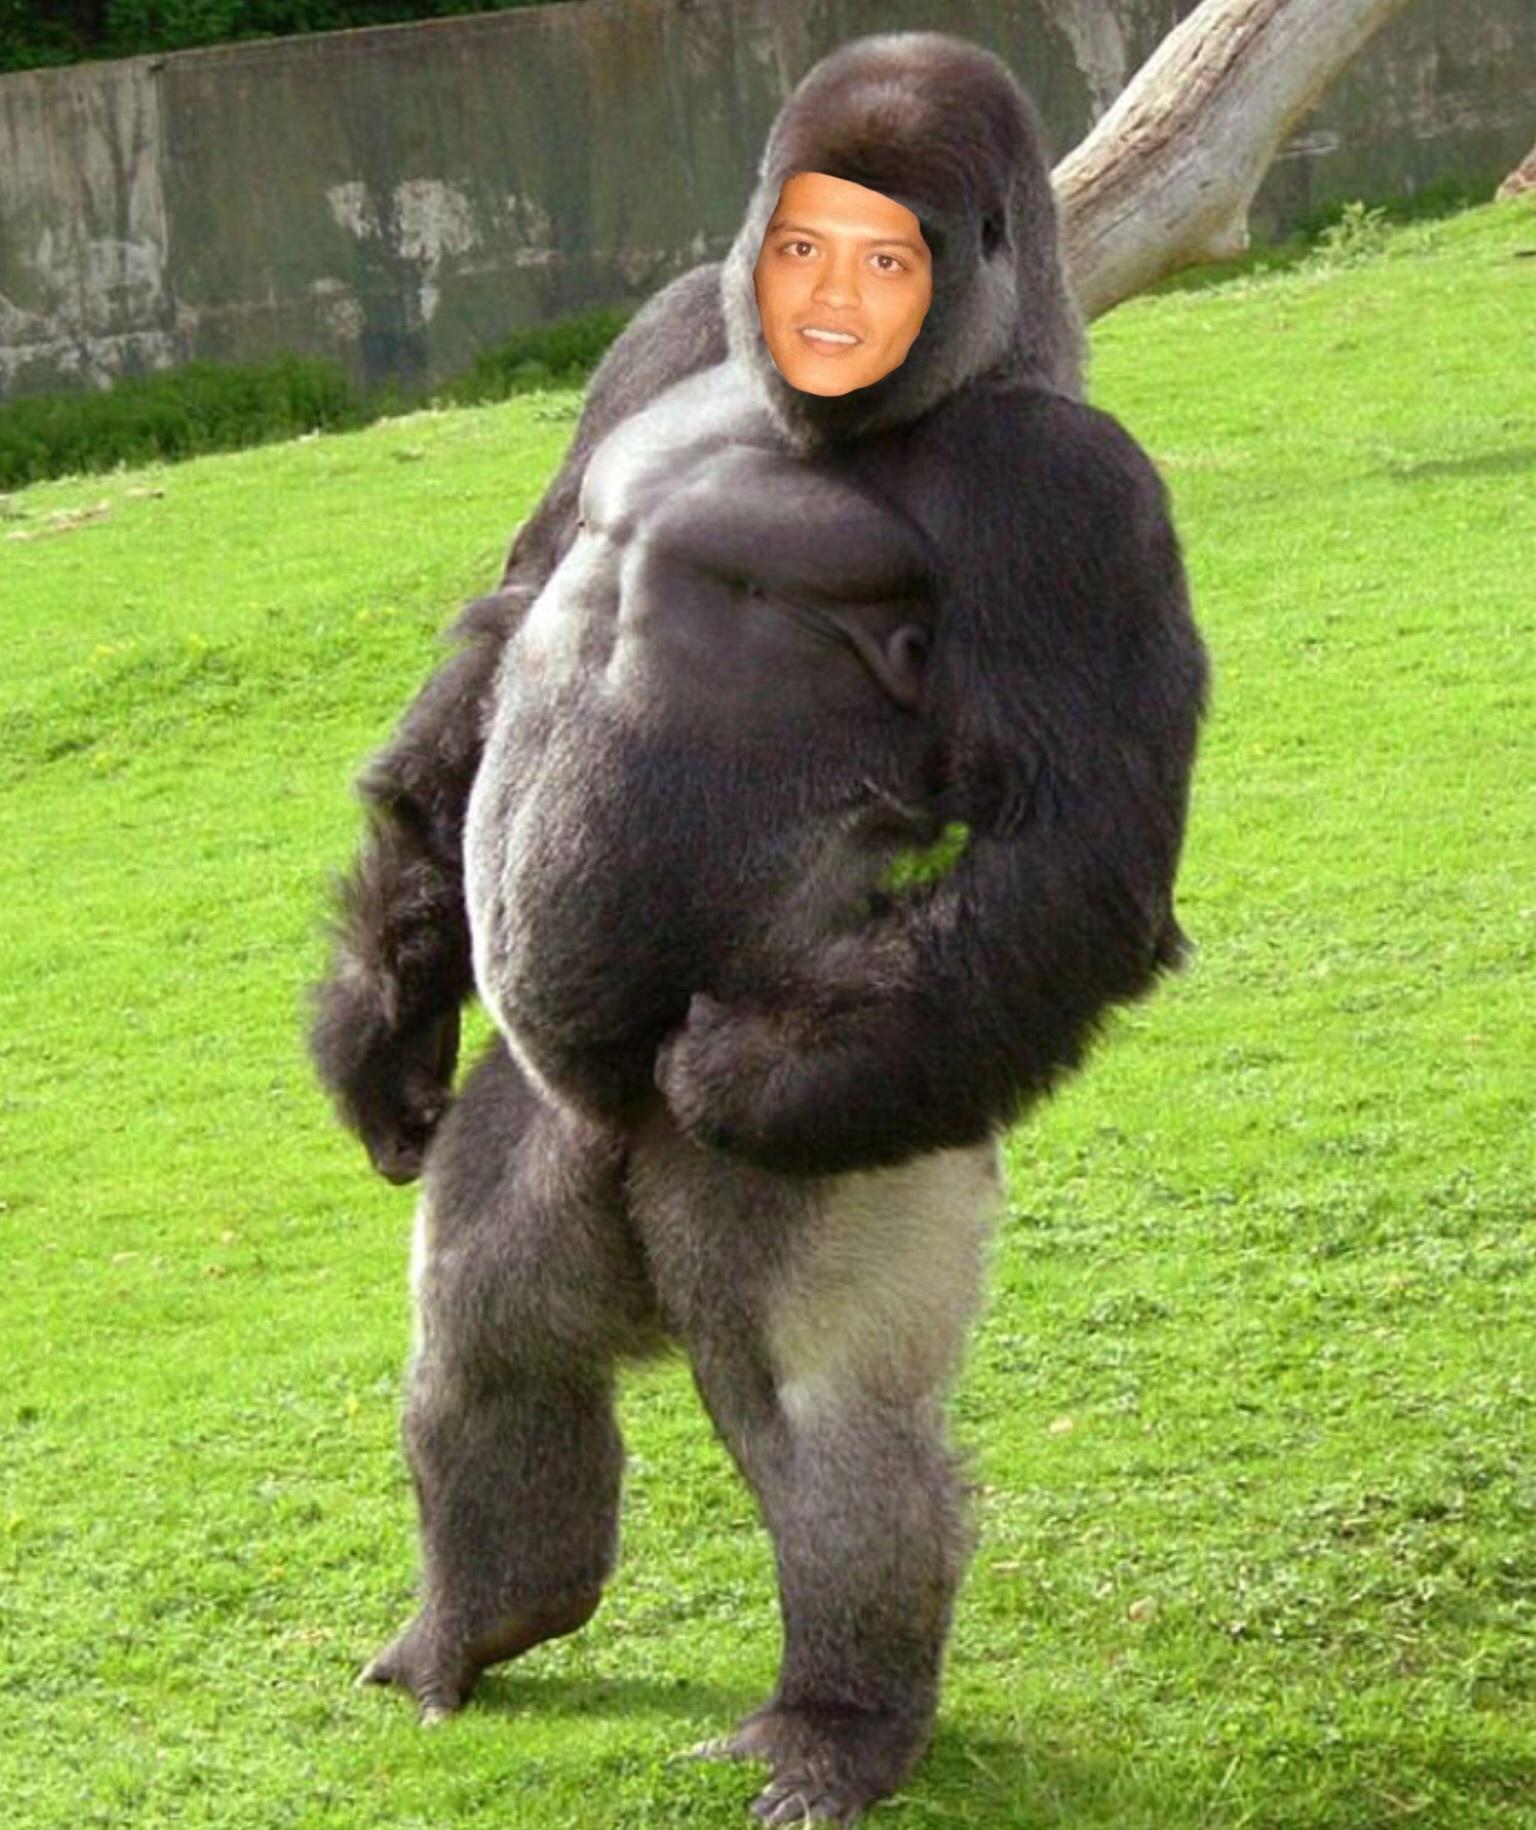 Gorilla penis nackt download